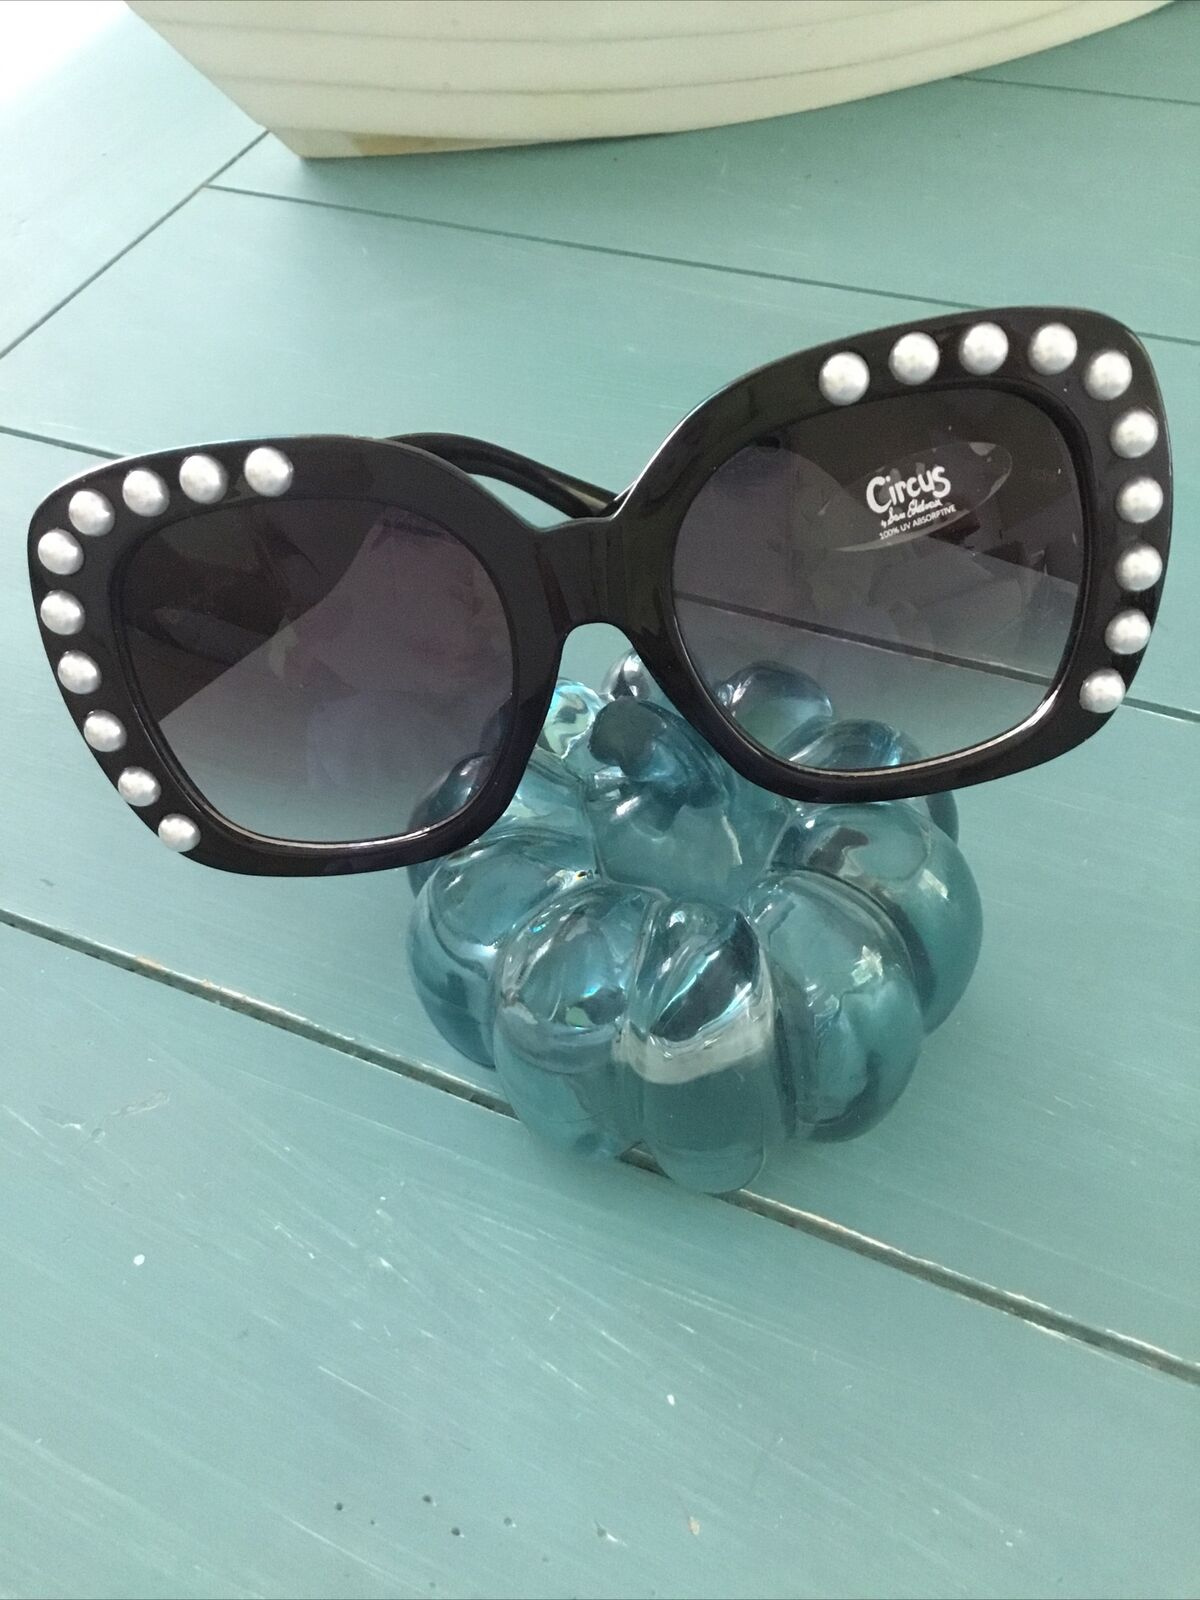 Circus by Sam Edelman Women's Sunglasses Black Oversized w Pearls